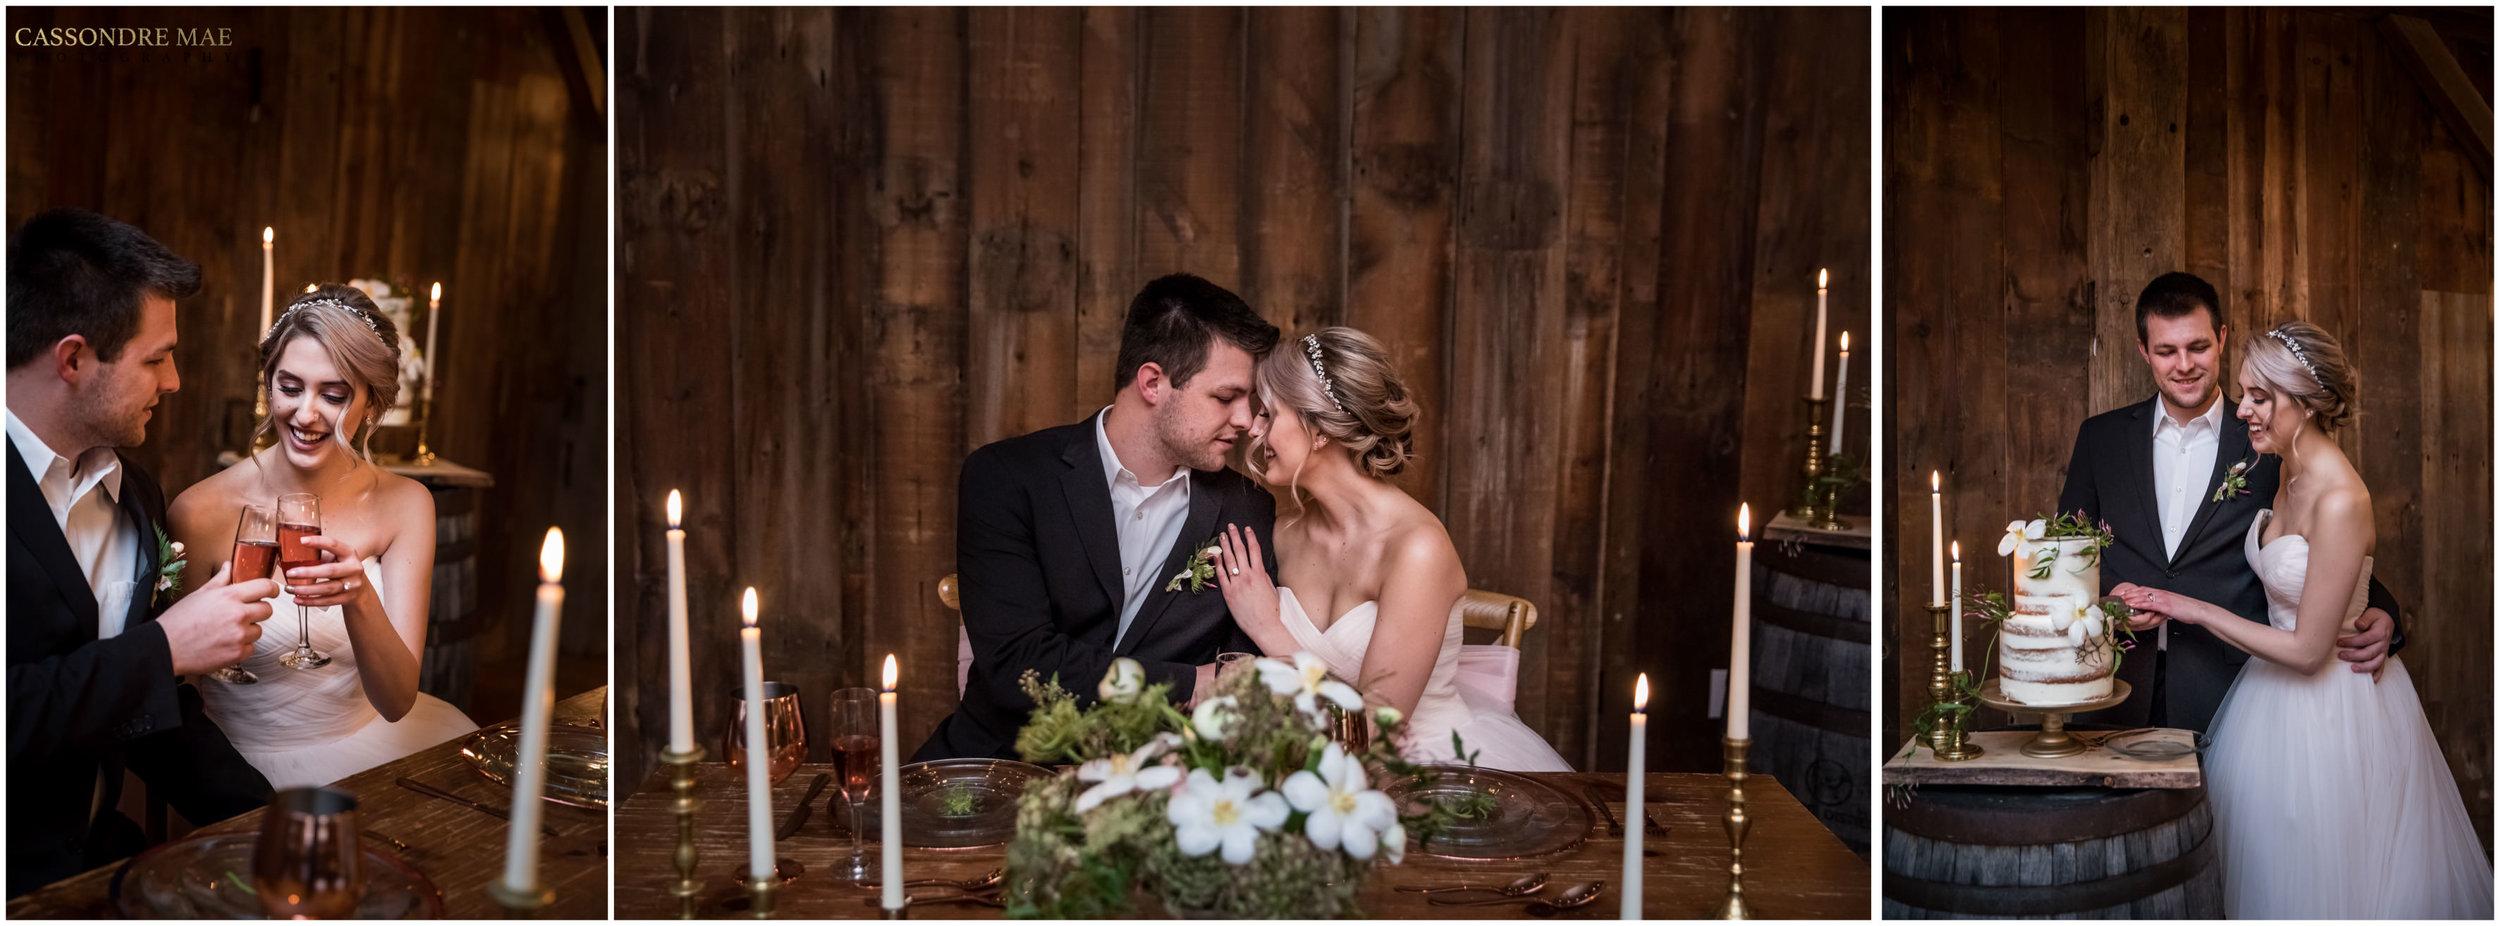 Cassondre Mae Photography Preston Barn Wedding 36.jpg